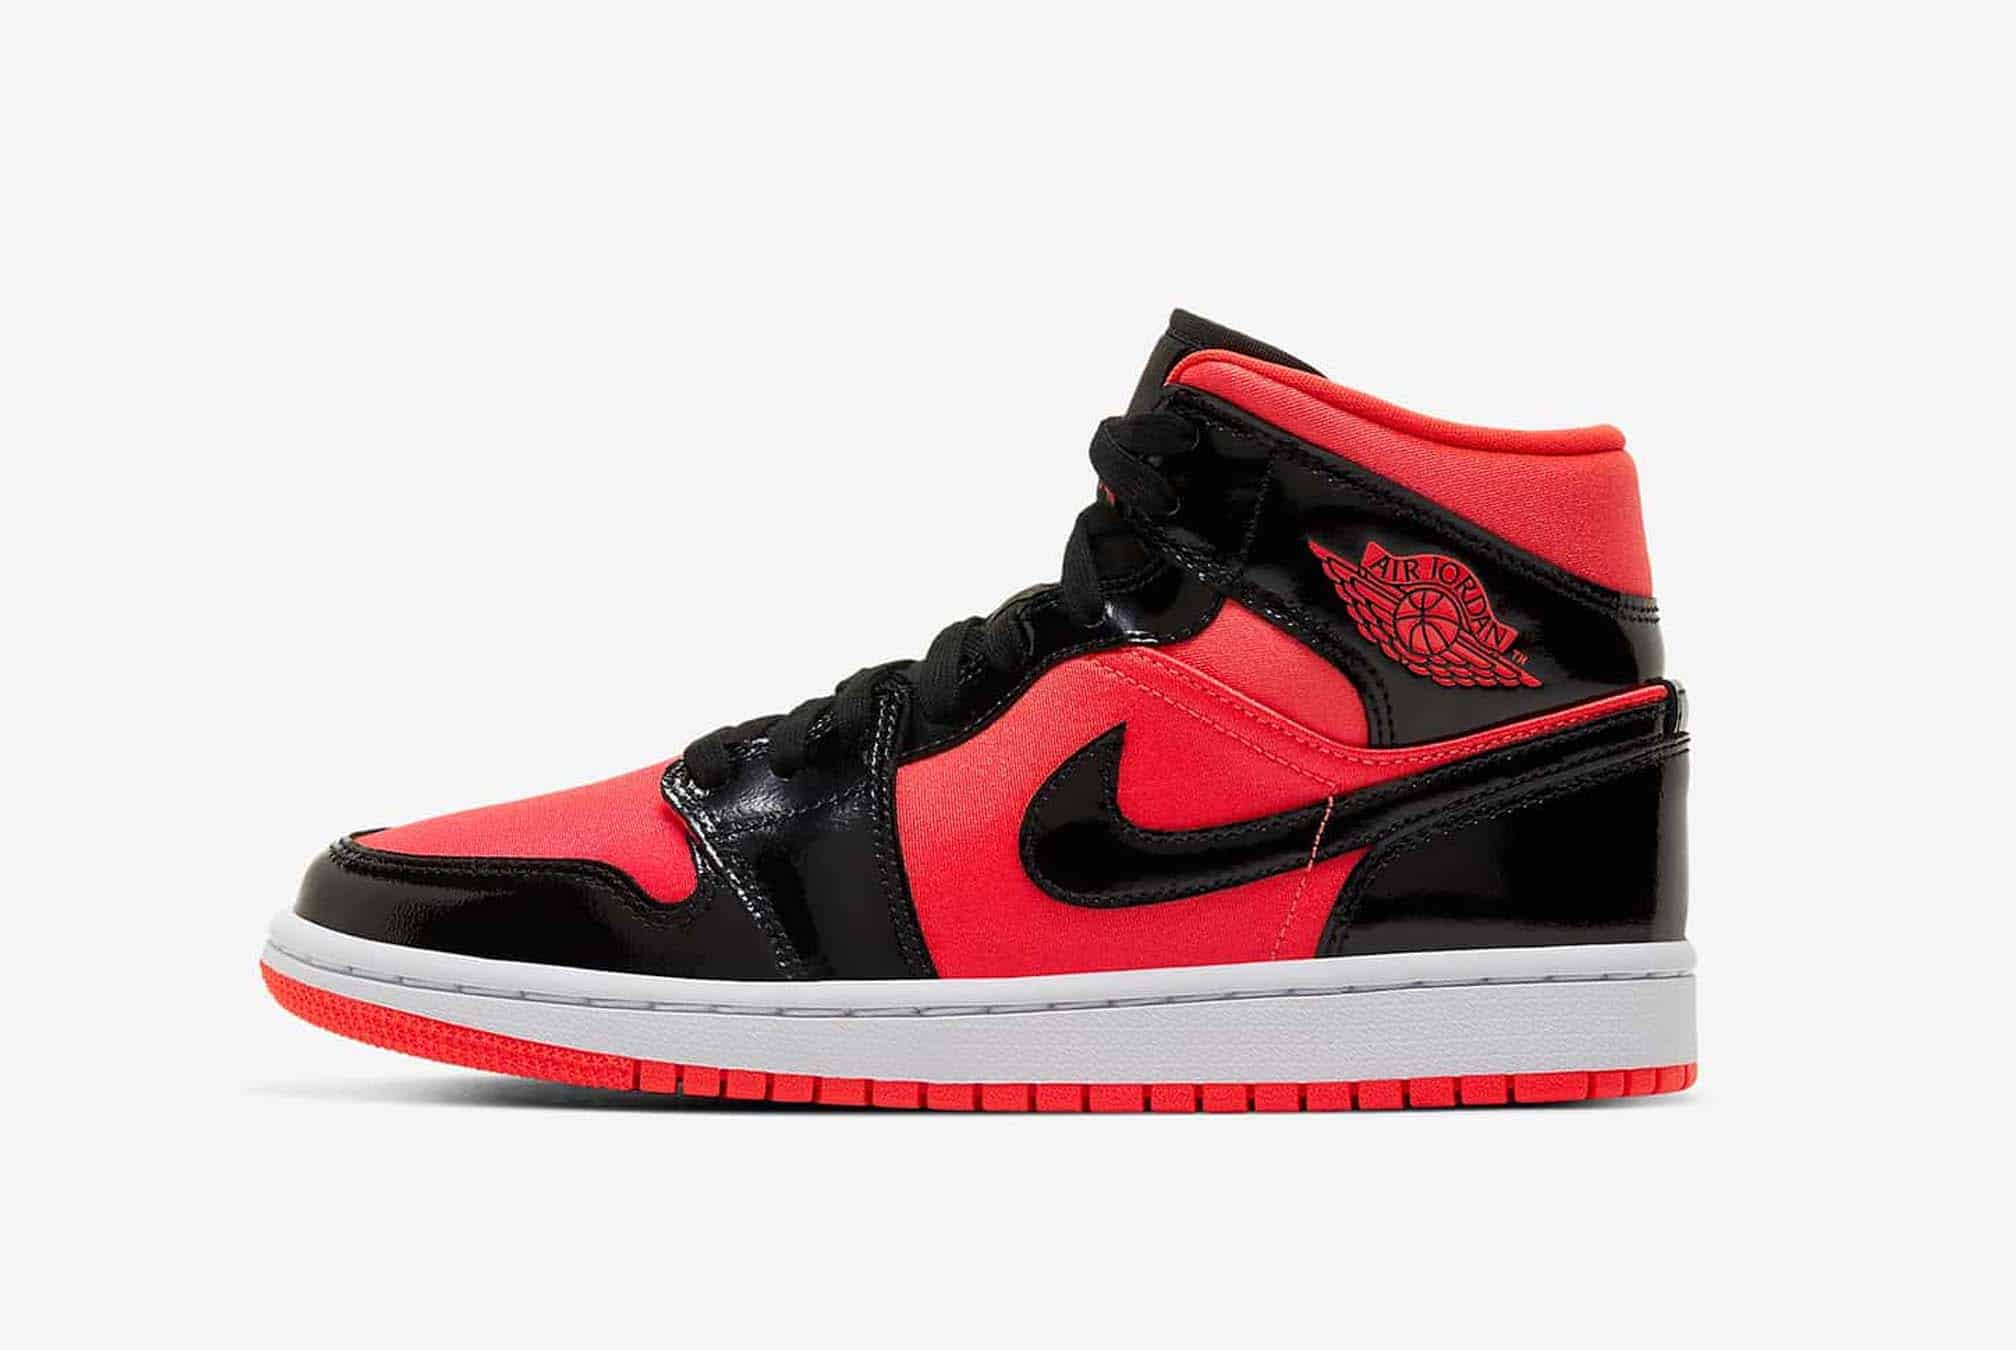 exclusive jordan sneakers